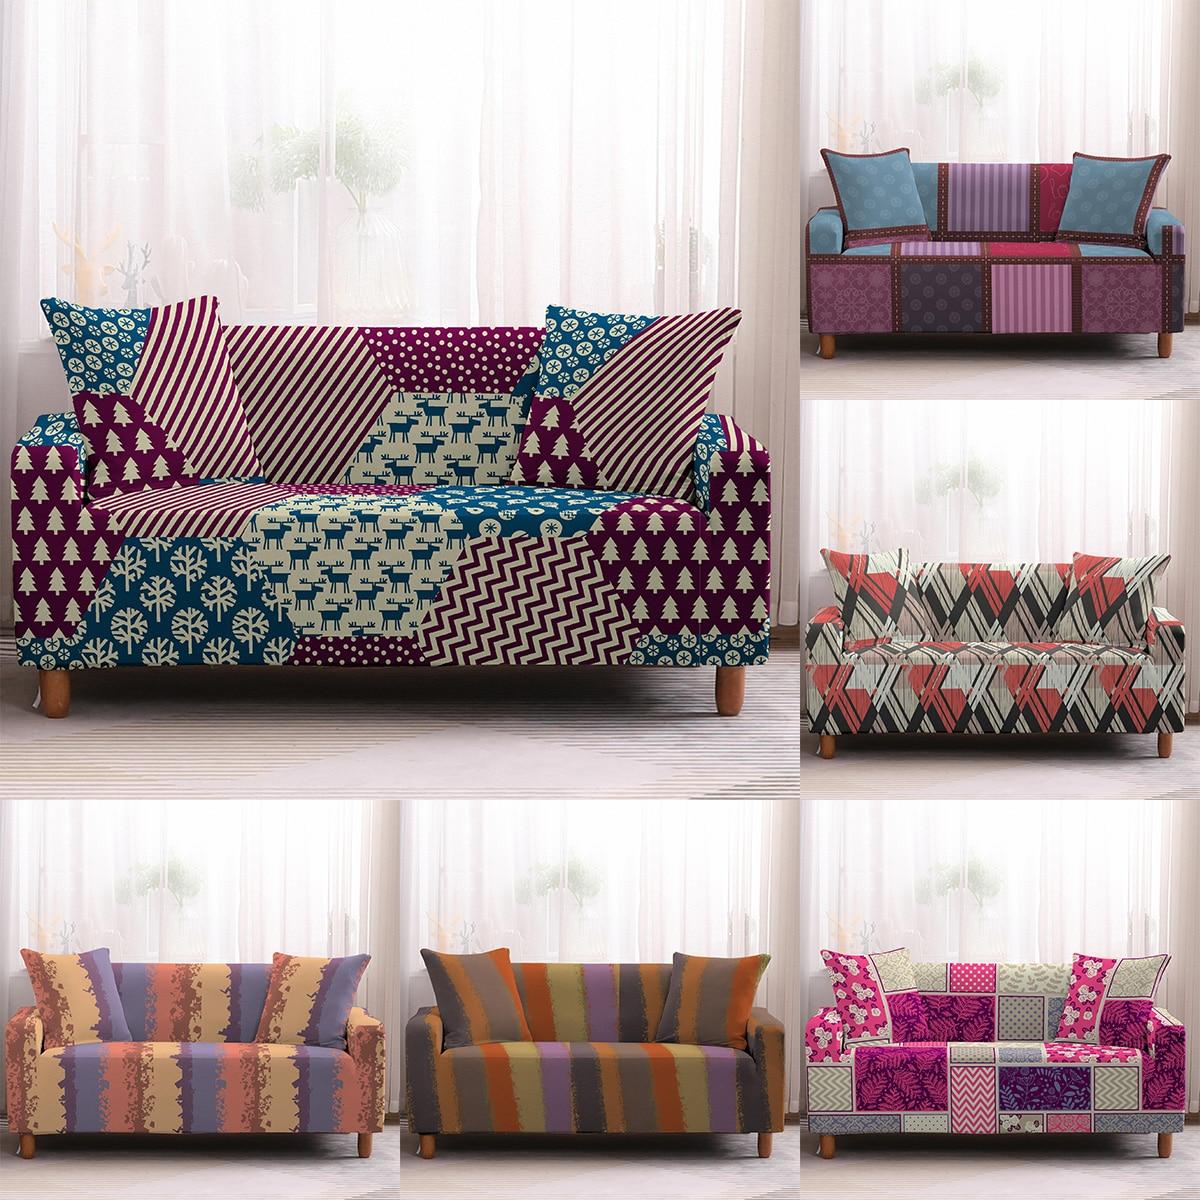 Didi Bohemian Sofa Cover Elastic Stretch Modern Chair Couch Cover